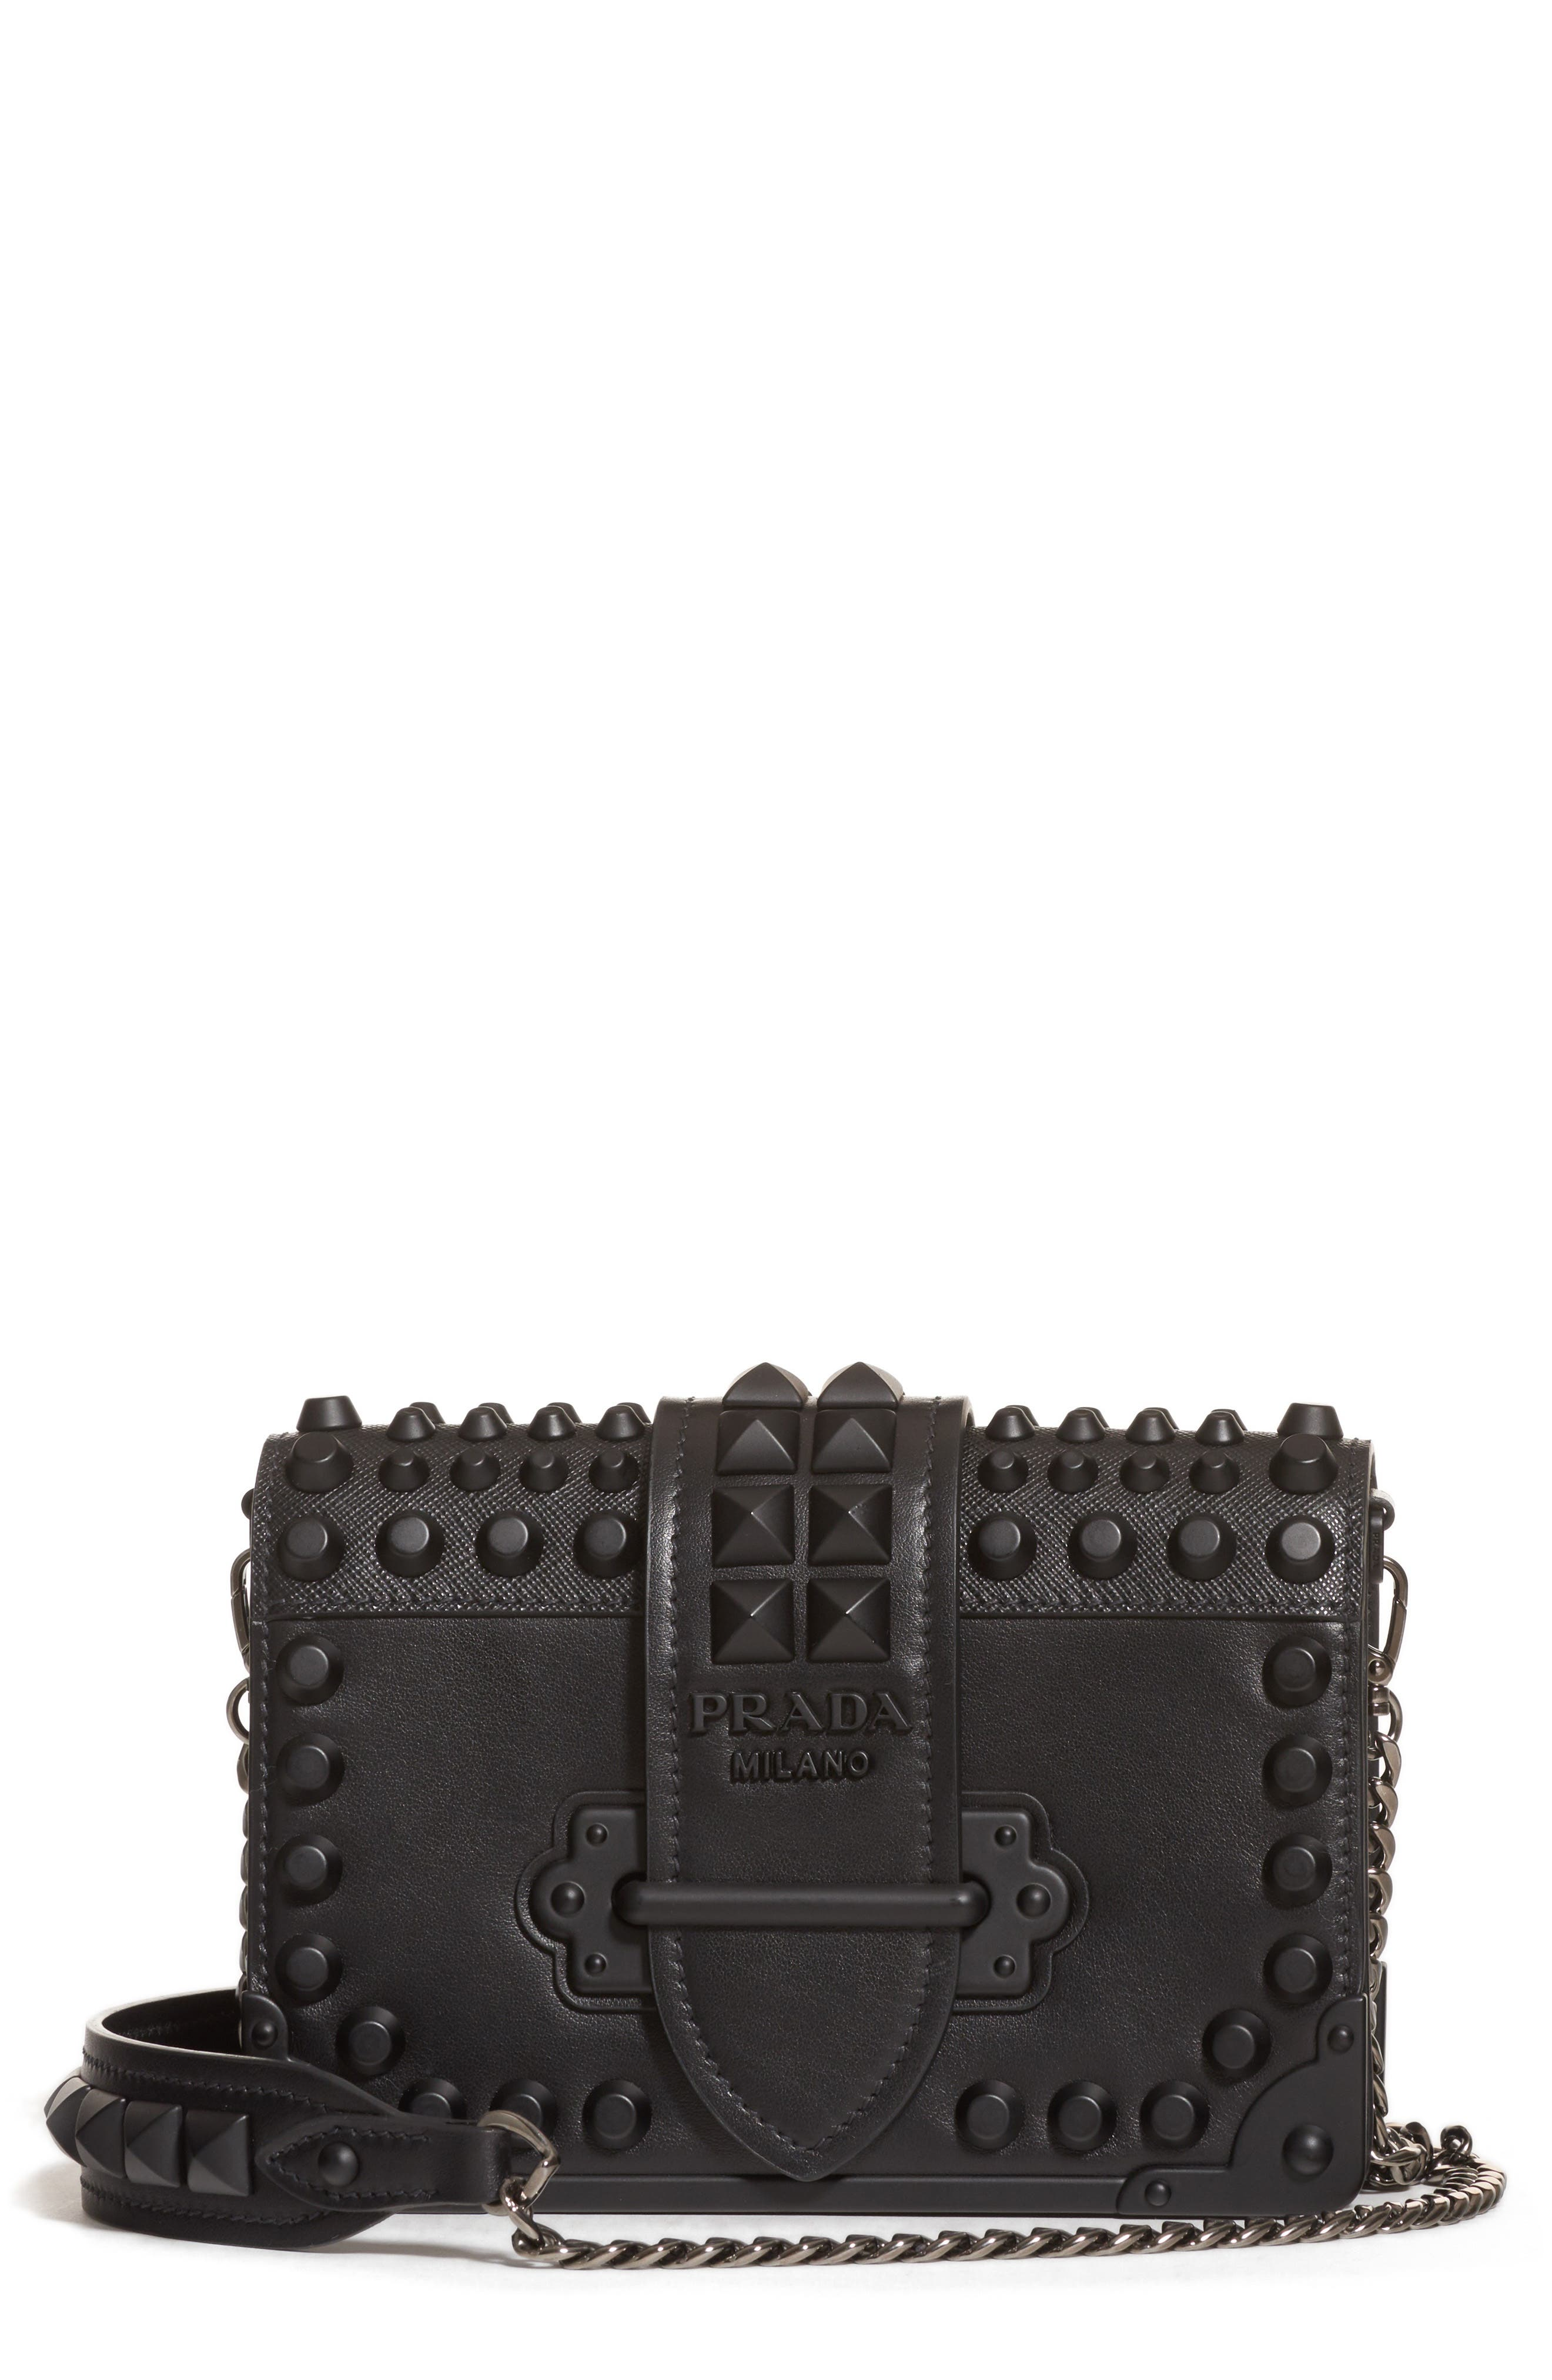 PRADA Cahier Studded Leather Crossbody Bag, Main, color, NERO/ NERO